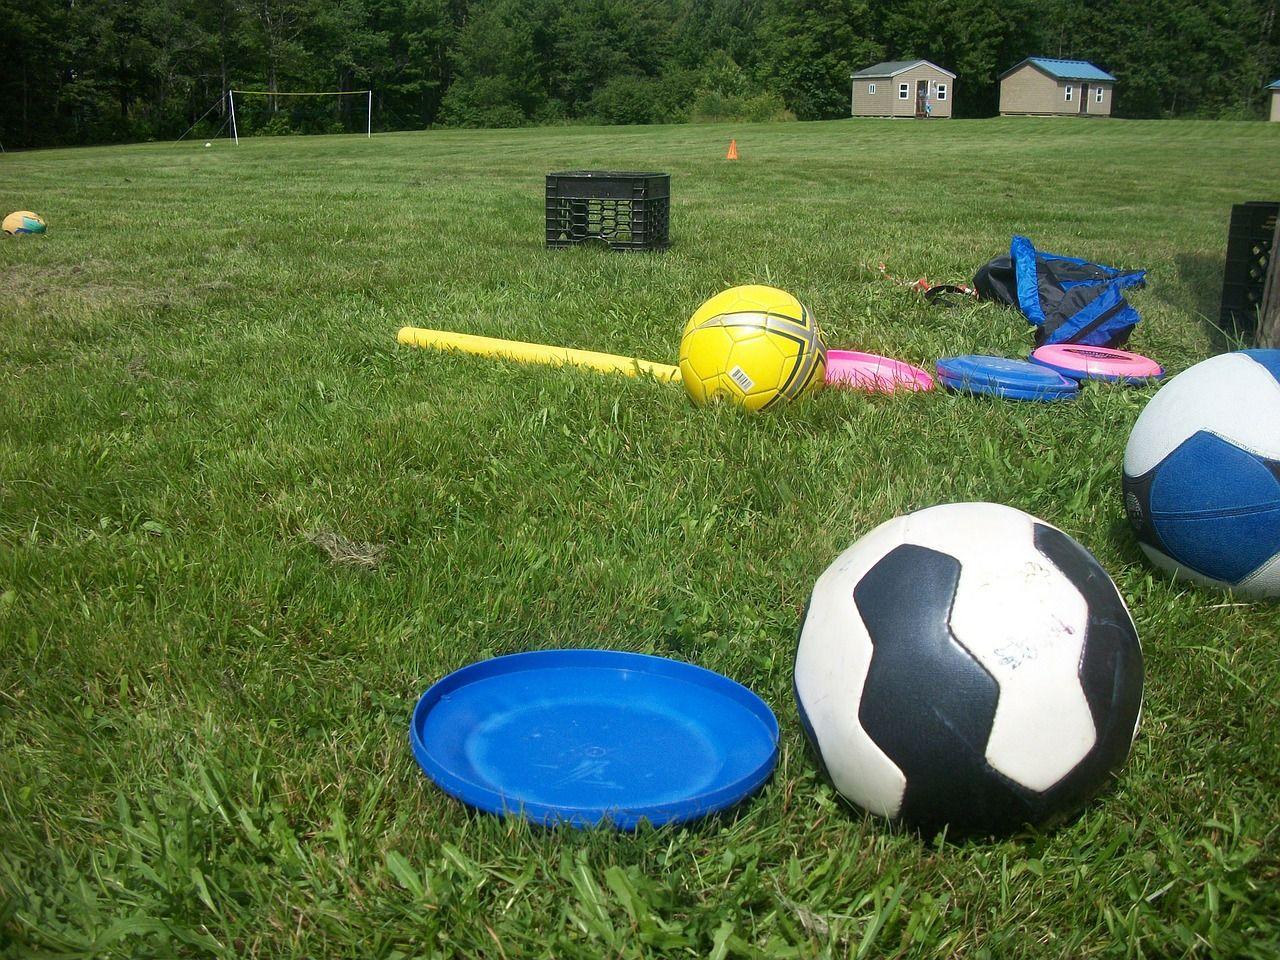 An image of sport equipment